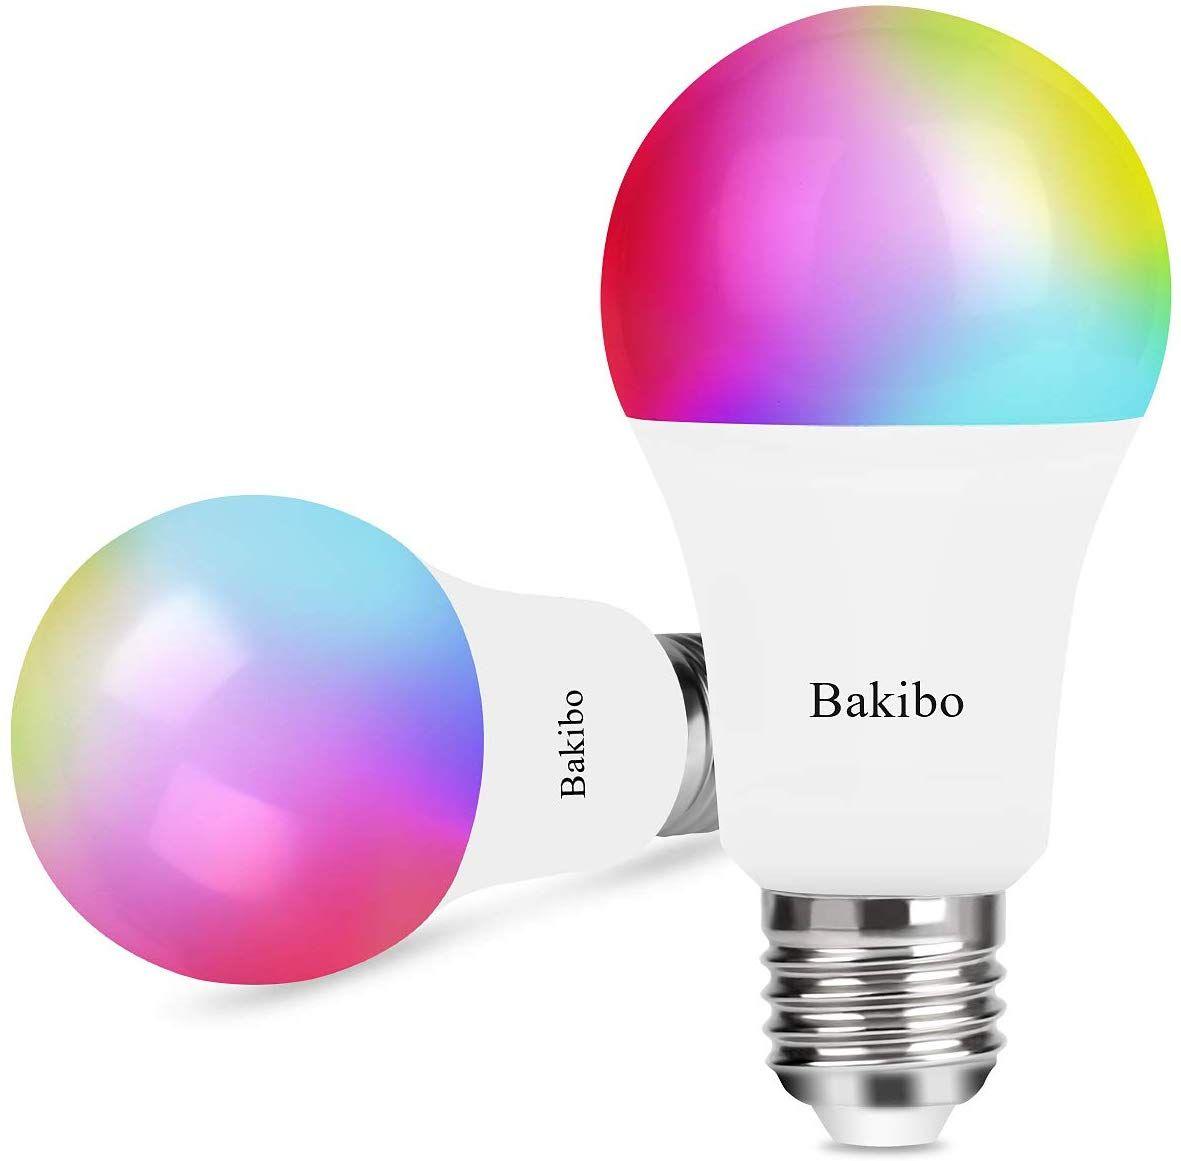 Bakibo Lampadina Wifi Intelligente Led Smart Dimmerabile 9w 1000lm E27 Multicolore Lampadina 2 Pcs In 2020 Led Lampe Led Gluhbirnen Led